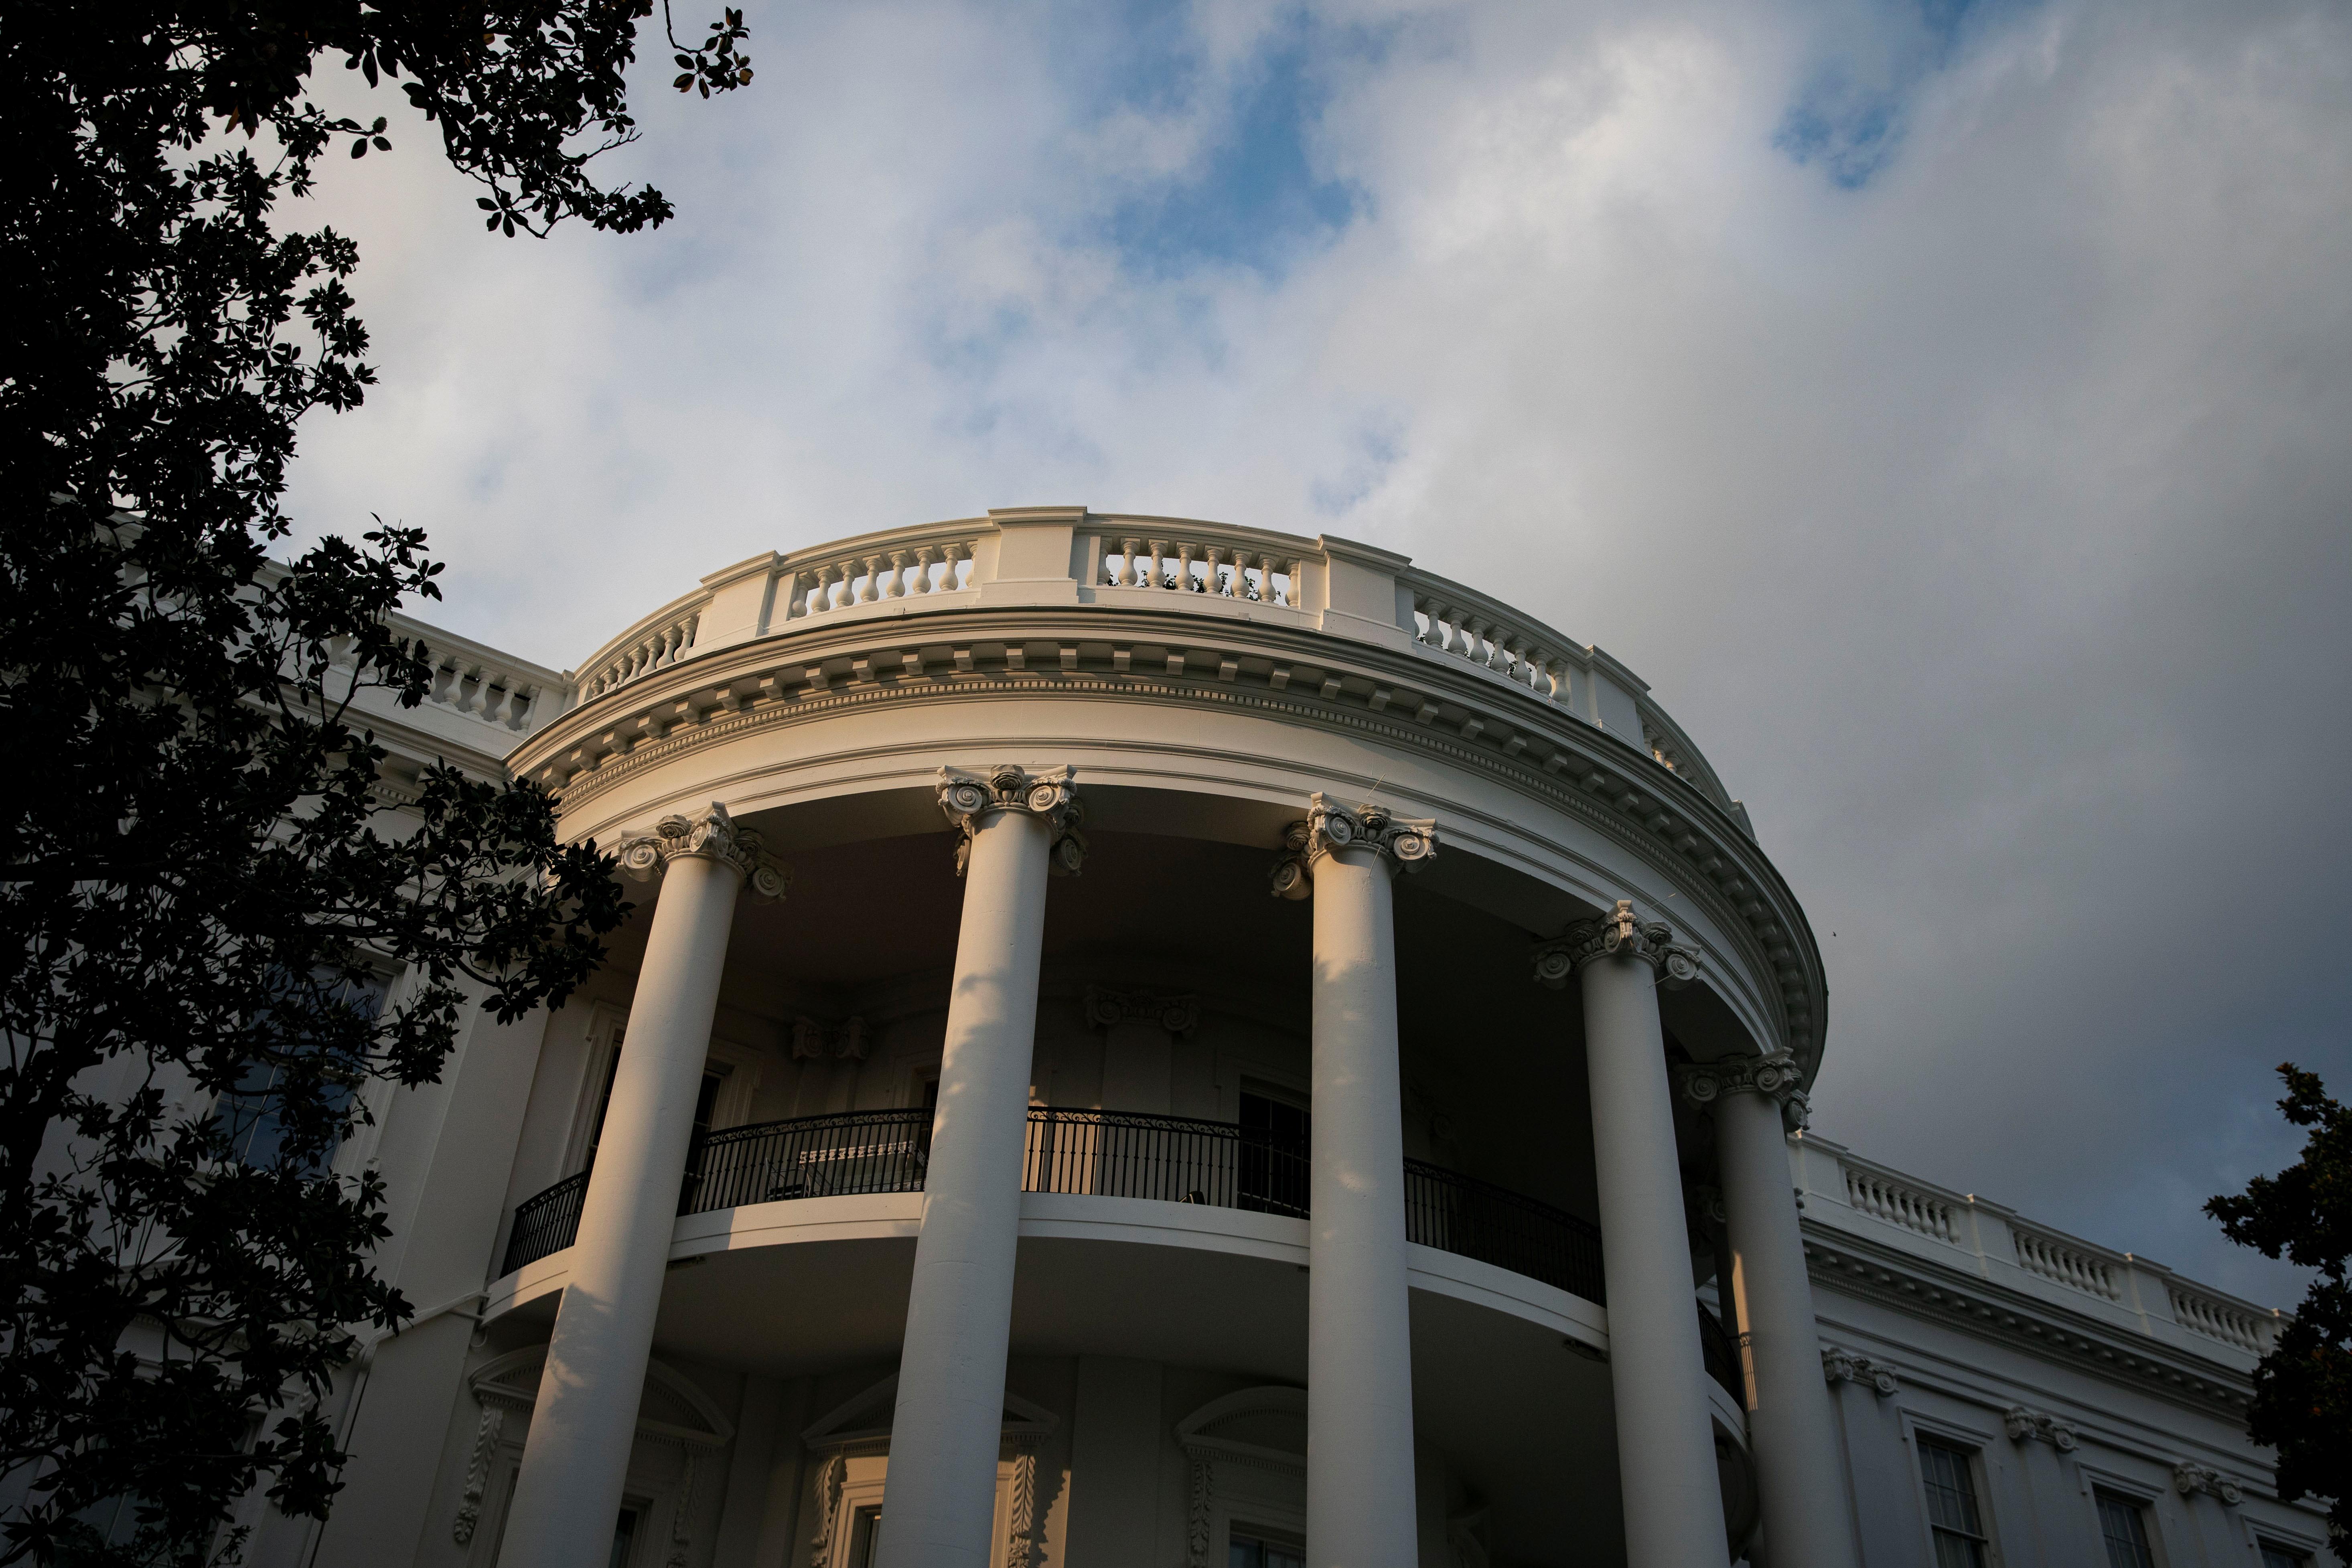 The White House in Washington, U.S., August 29, 2021. REUTERS/Al Drago